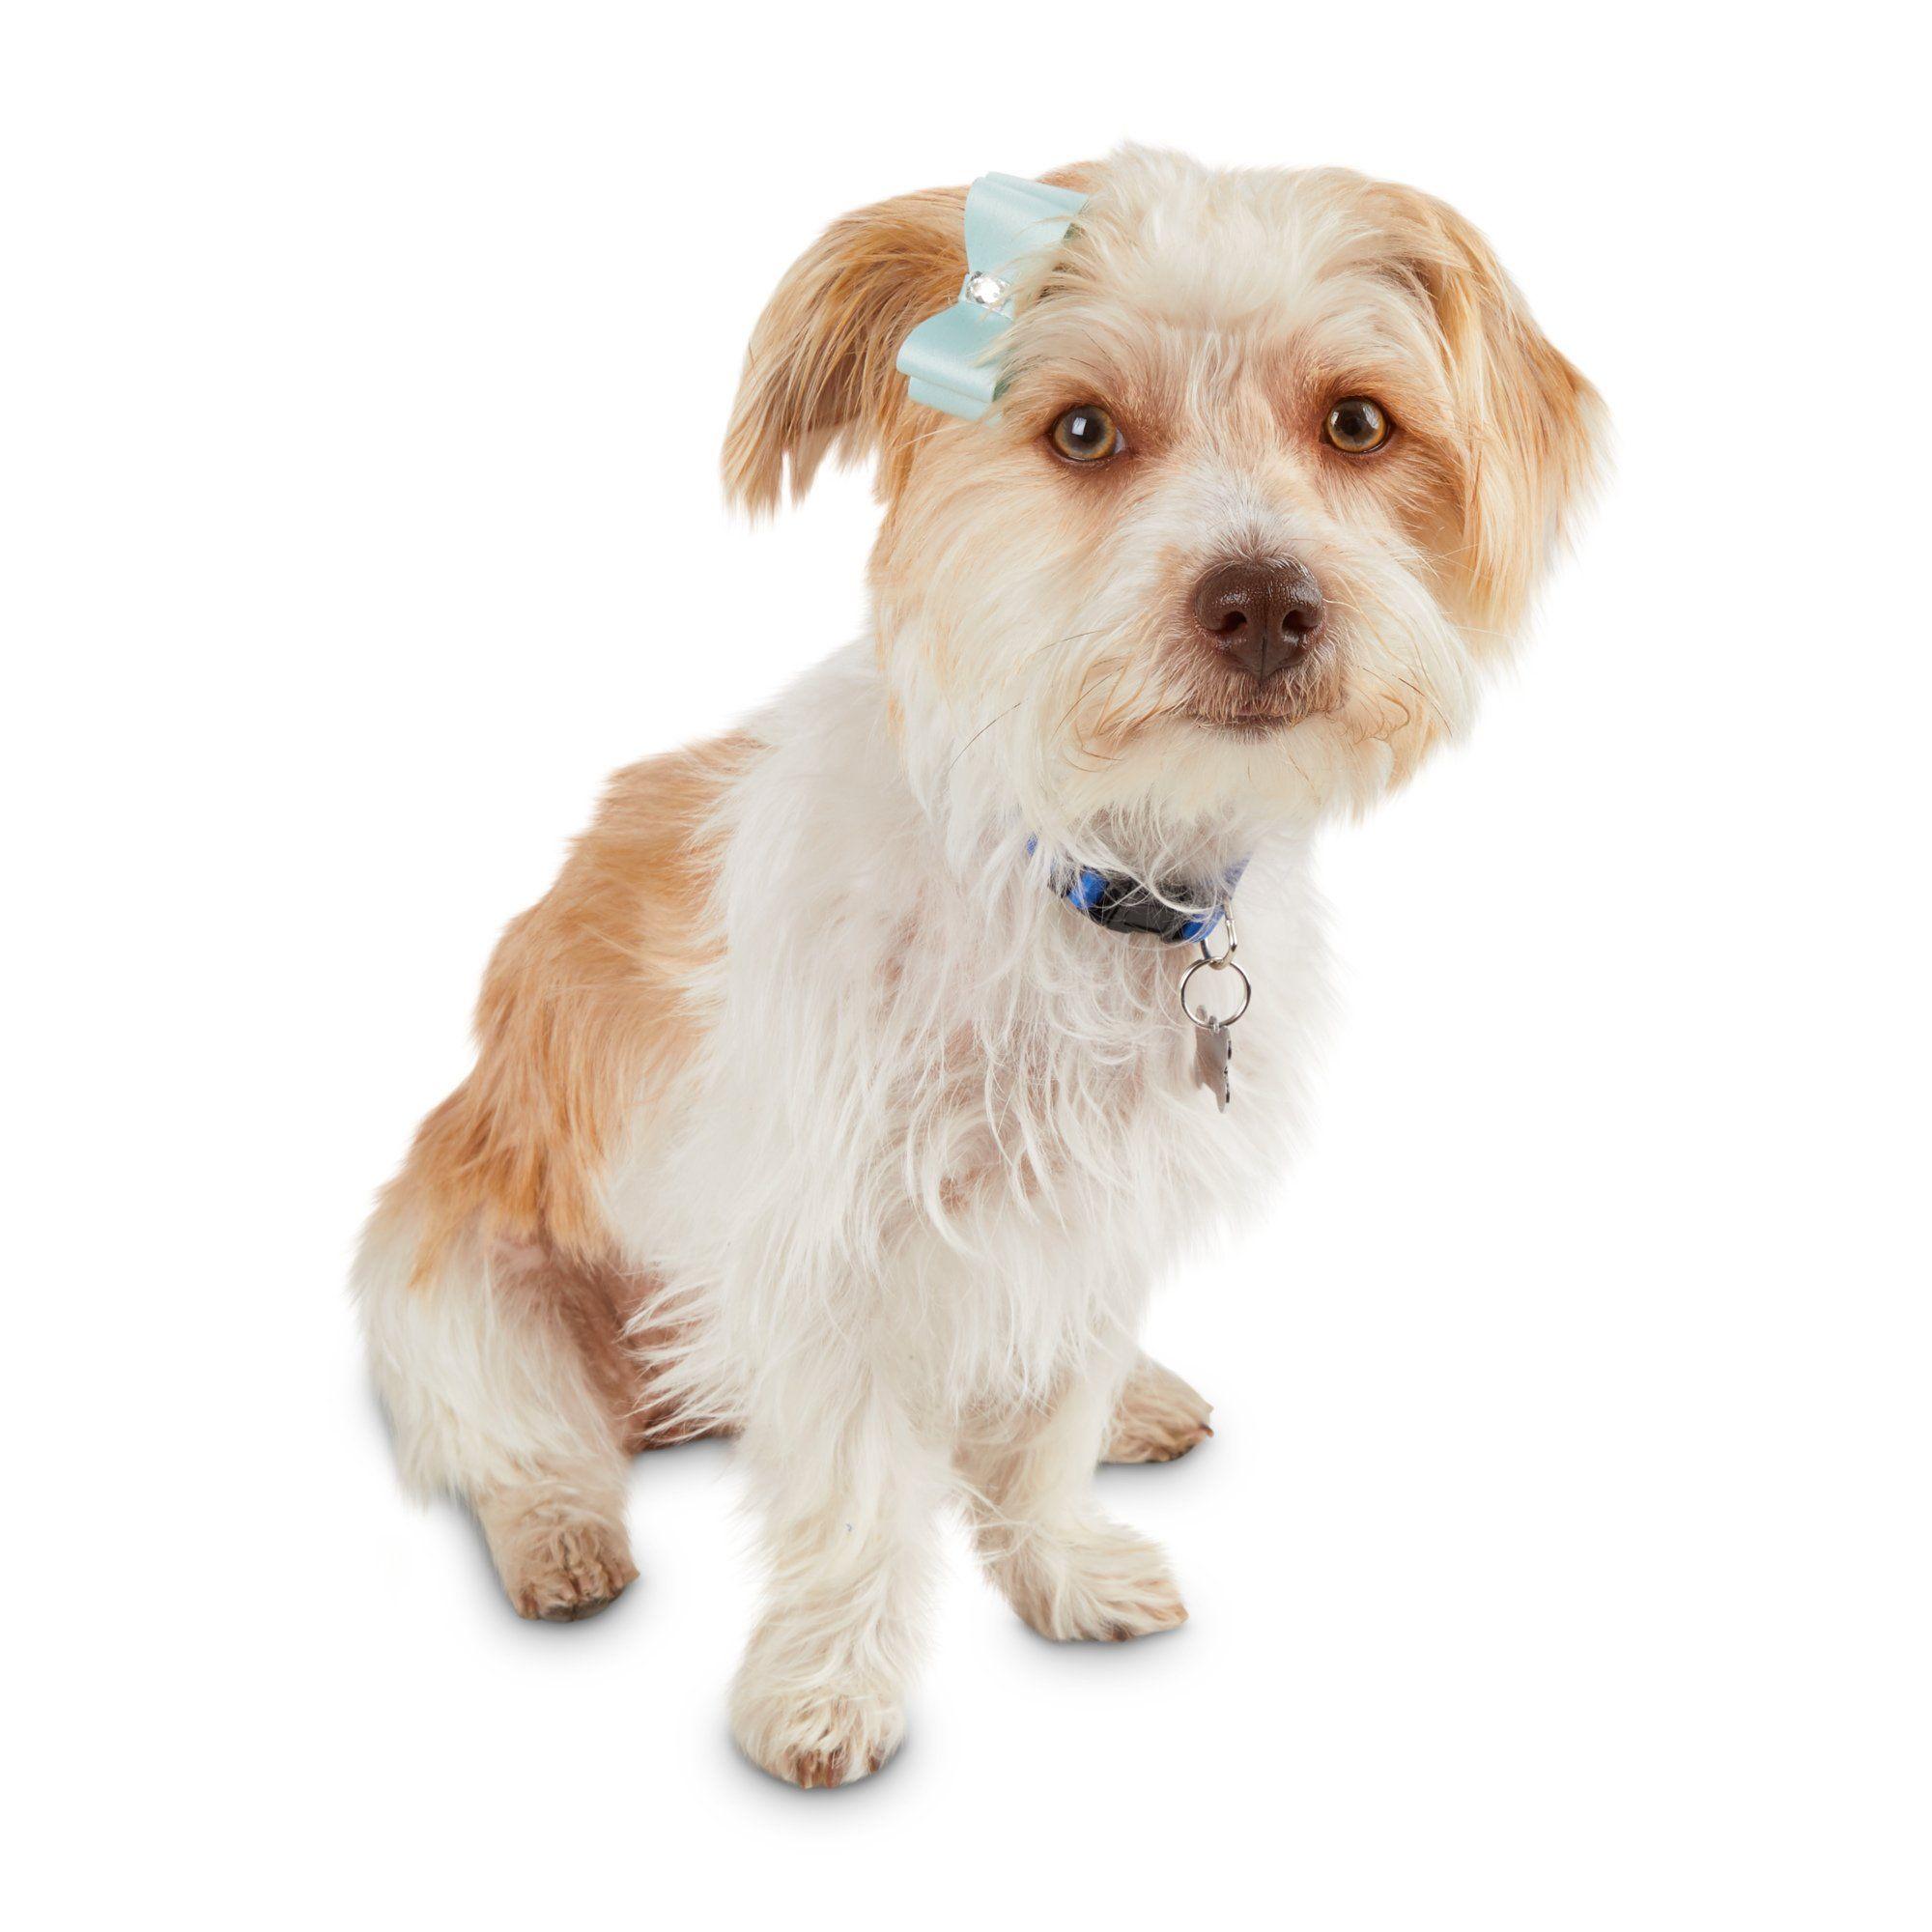 Bond Co Bejeweled Dog Bow Set Pack Of 2 Dog Bows Dogs Live Animals